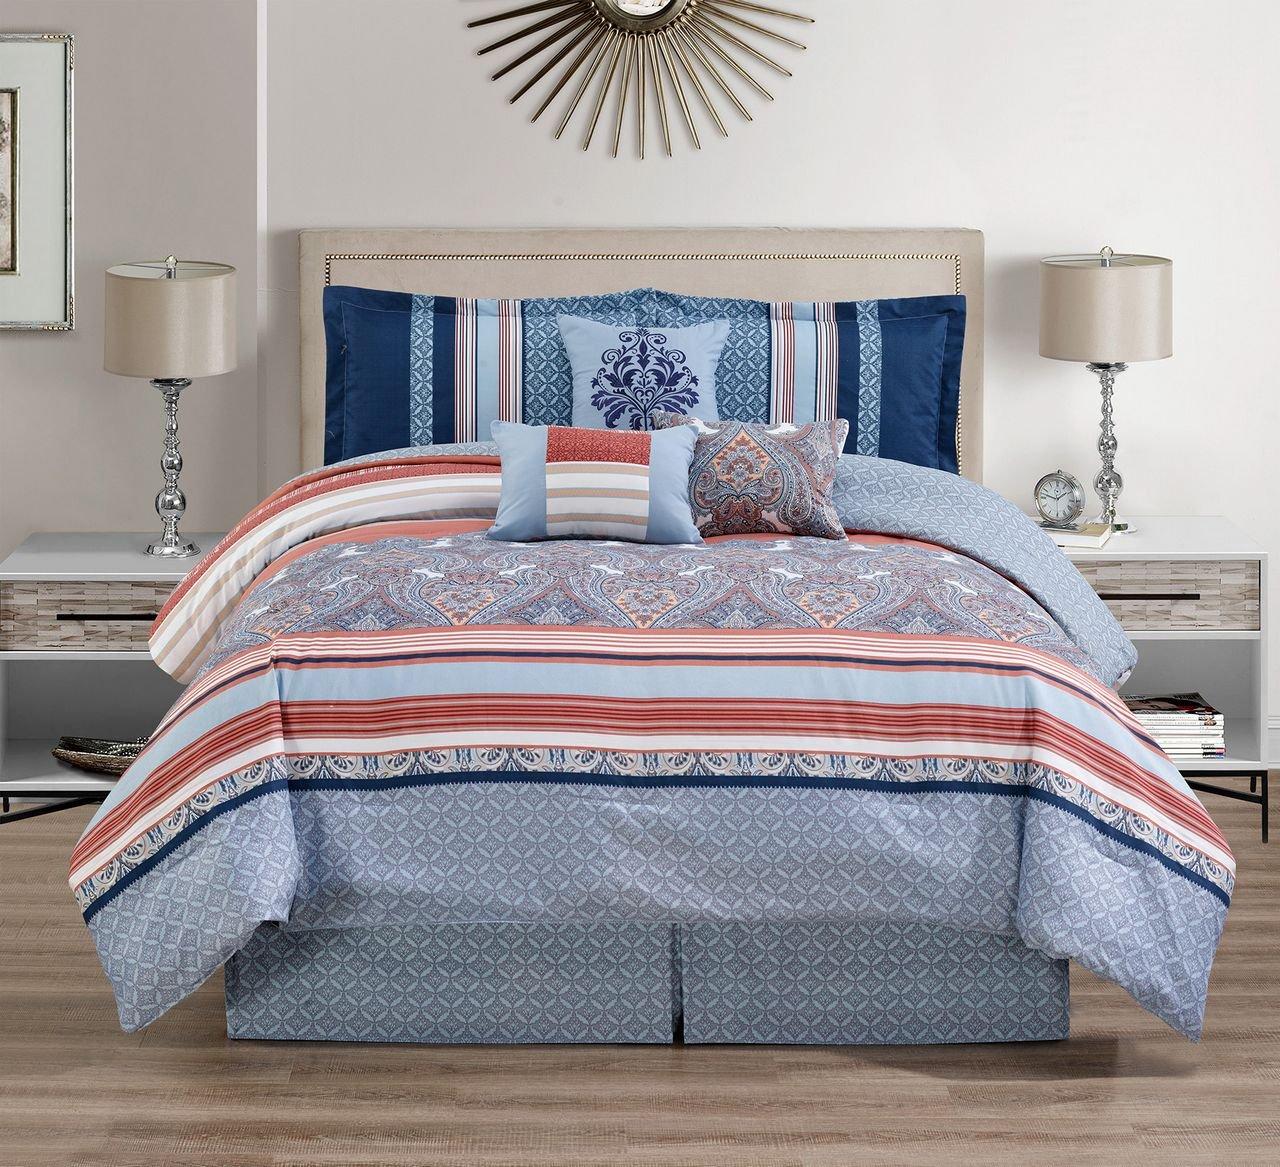 7 Piece Medallion Coral/Blue Comforter Set Queen